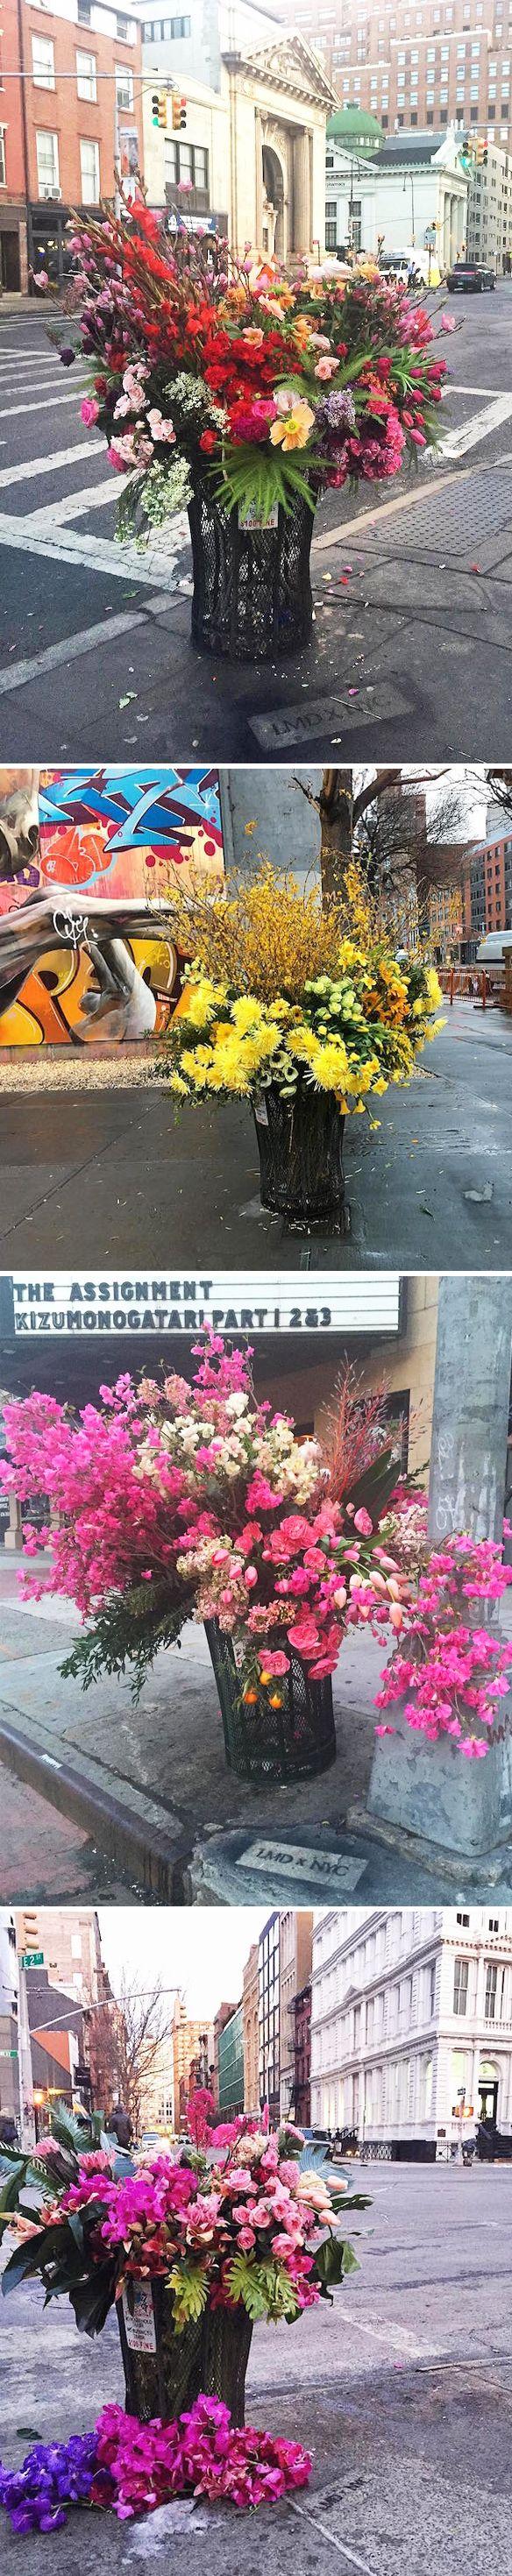 Best Flowers Vase Ideas On Pinterest Diy Flower Vases - Artist turns nyc trash cans into giant flower filled vases